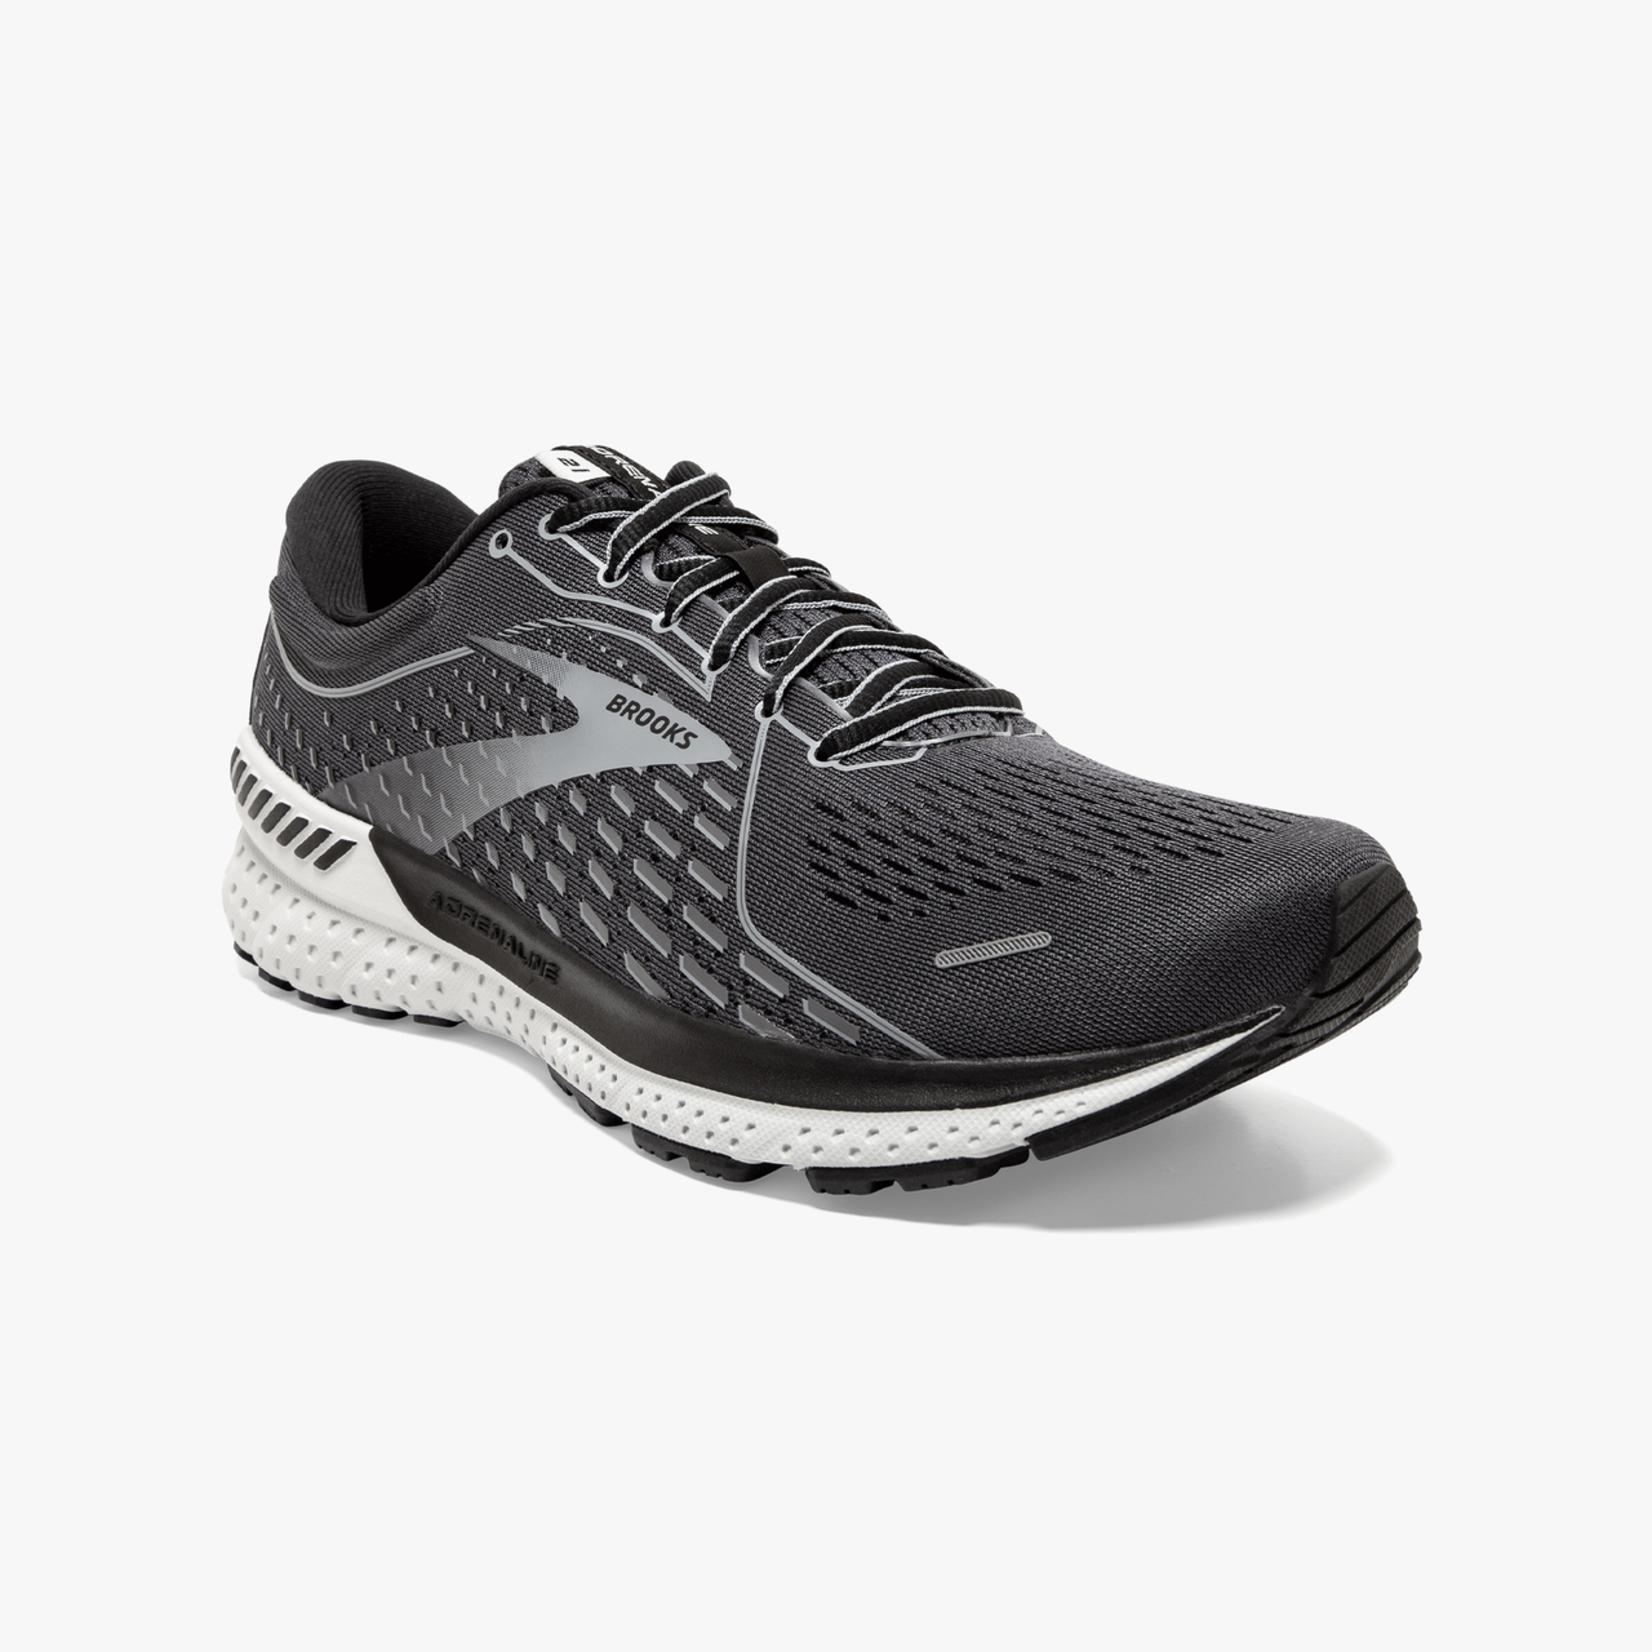 Brooks Brooks Running Shoes, Adrenaline GTS 21, Mens